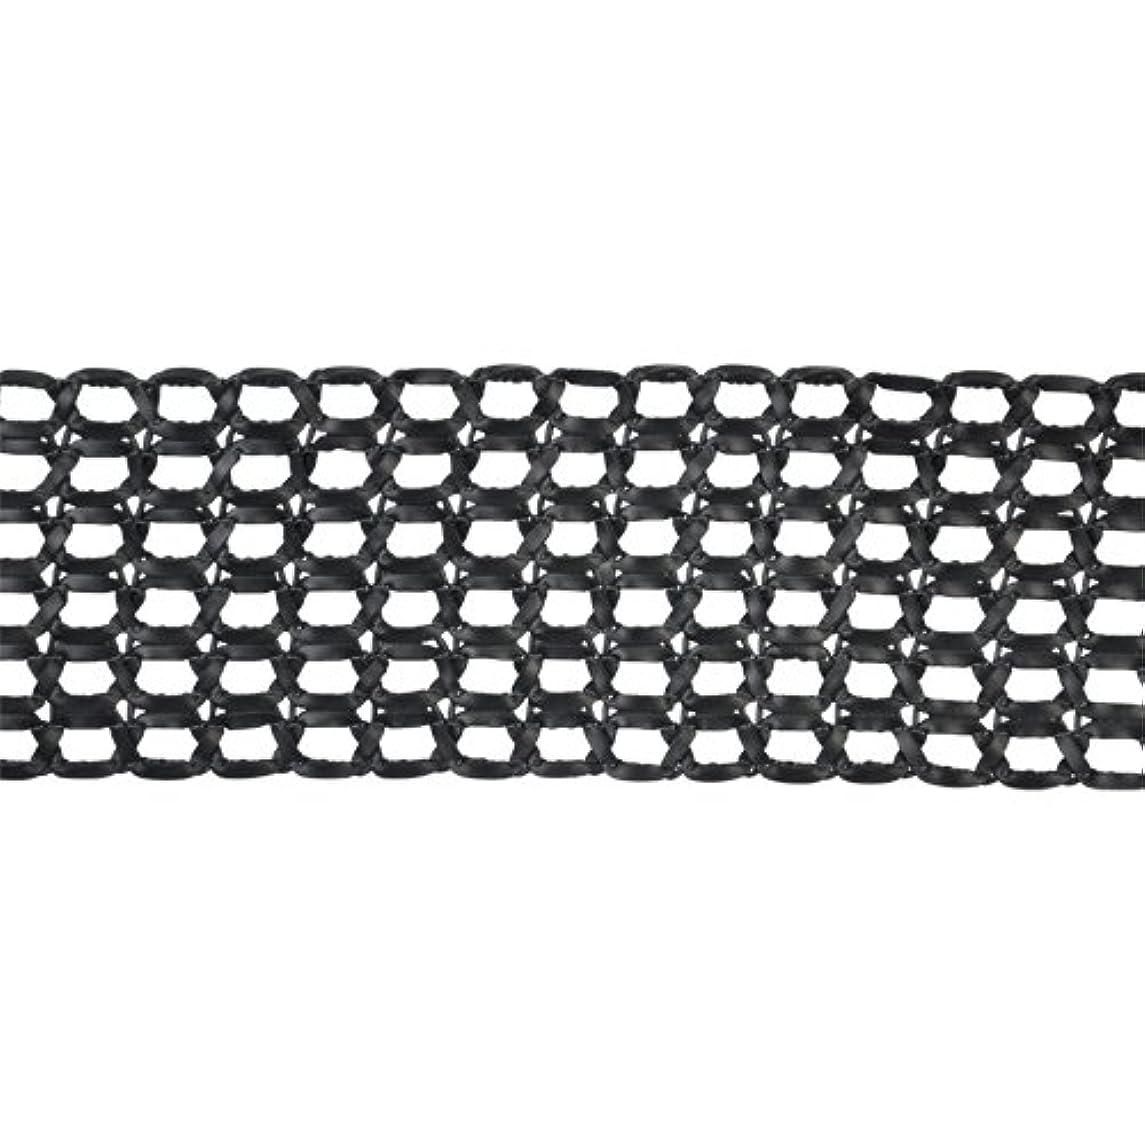 Belagio Enterprises 3-inch Faux Leather Woven Braid Trim 15 Yards, Black